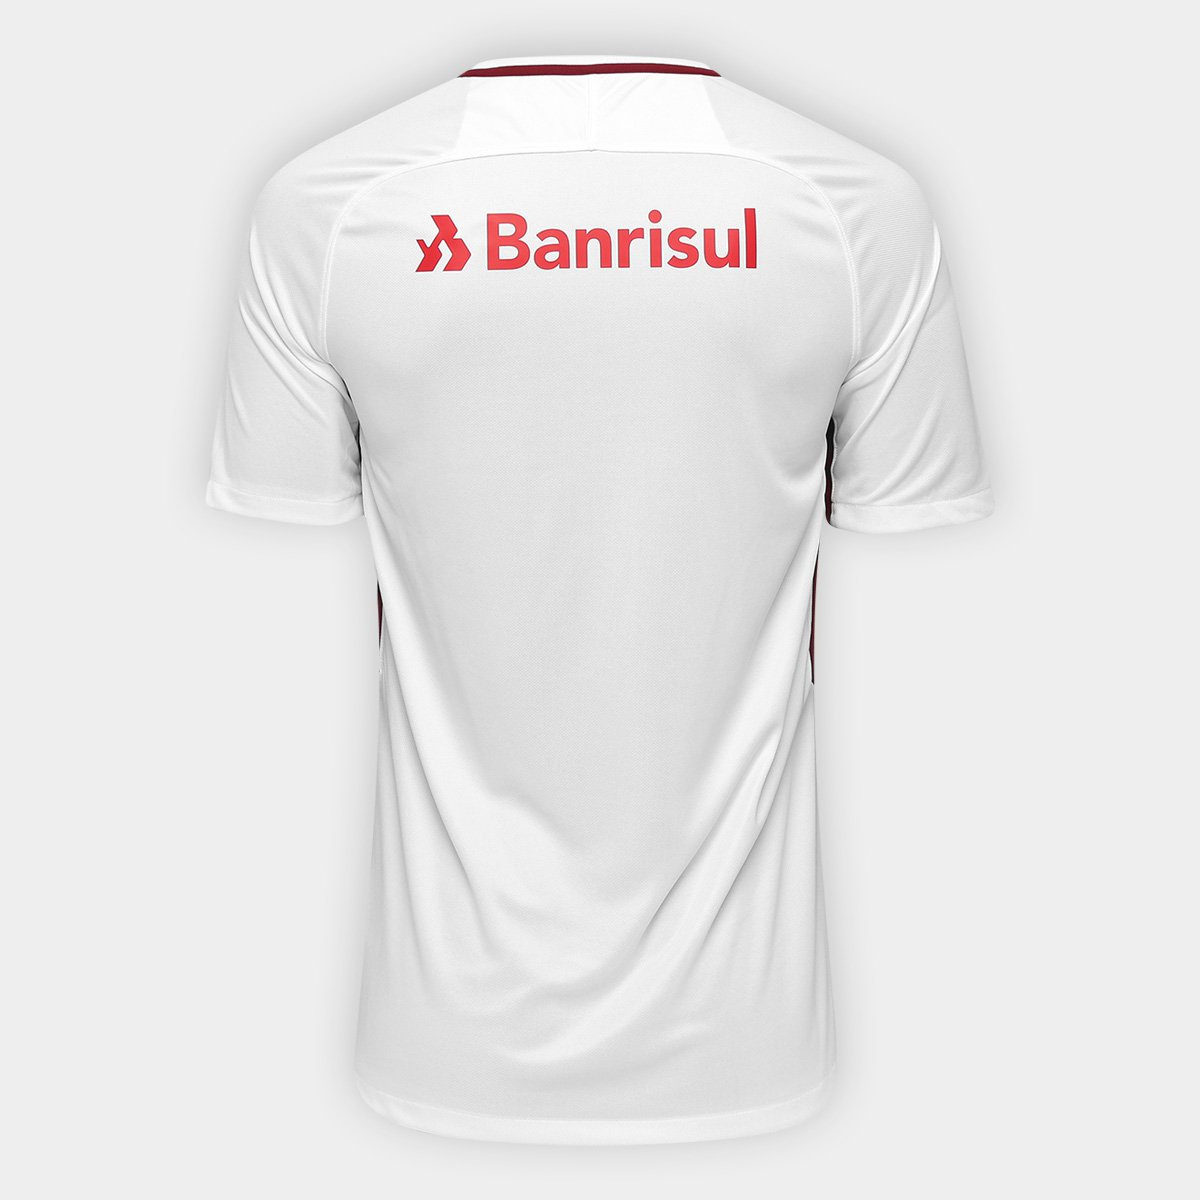 8b7ce0e106 Camisa Internacional II 17 18 s nº Torcedor Nike Masculina - Compre ...